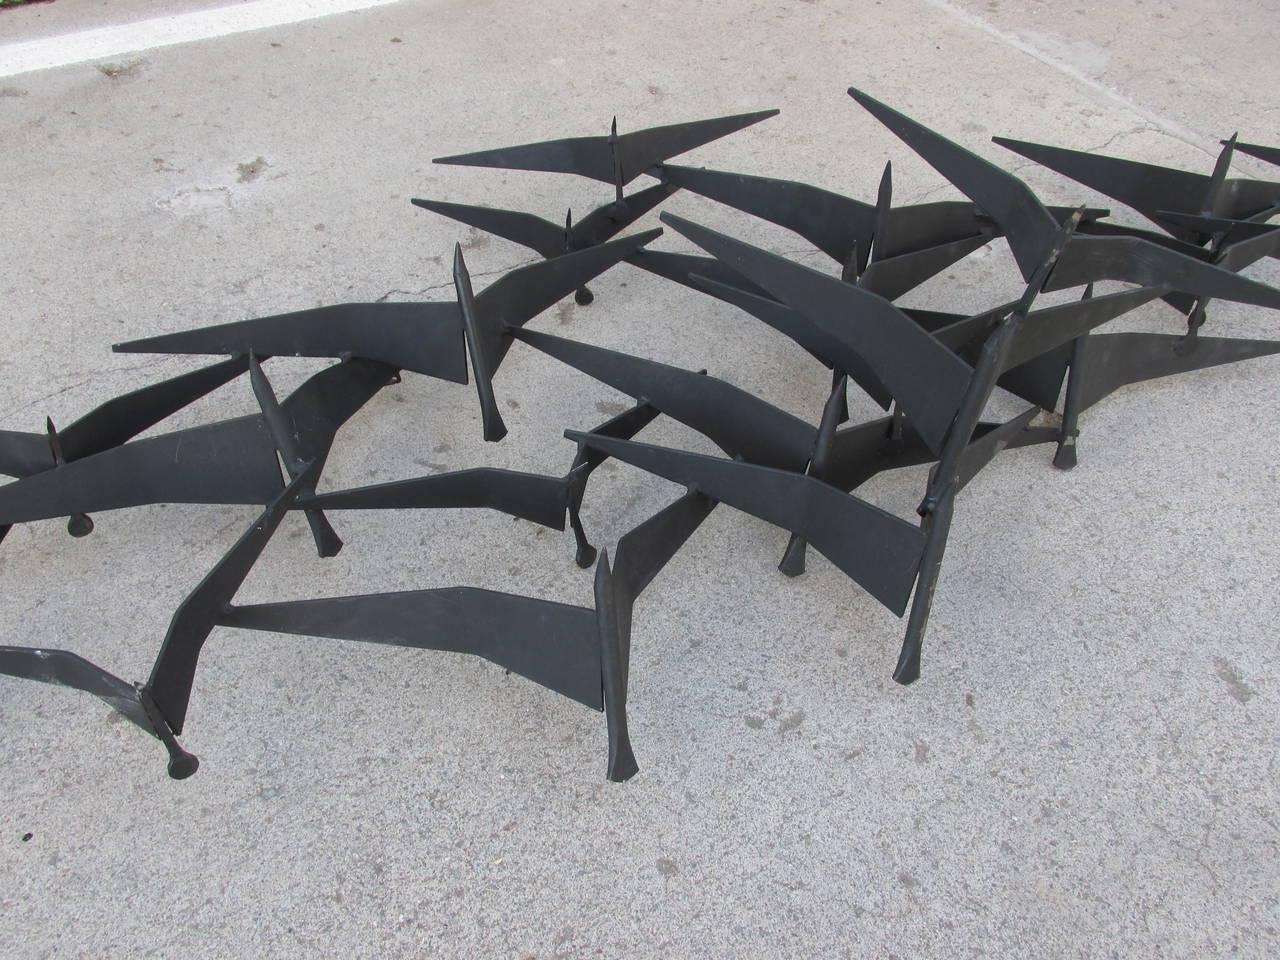 Panfan Site Regarding Metal Wall Art Birds In Flight (View 10 of 15)